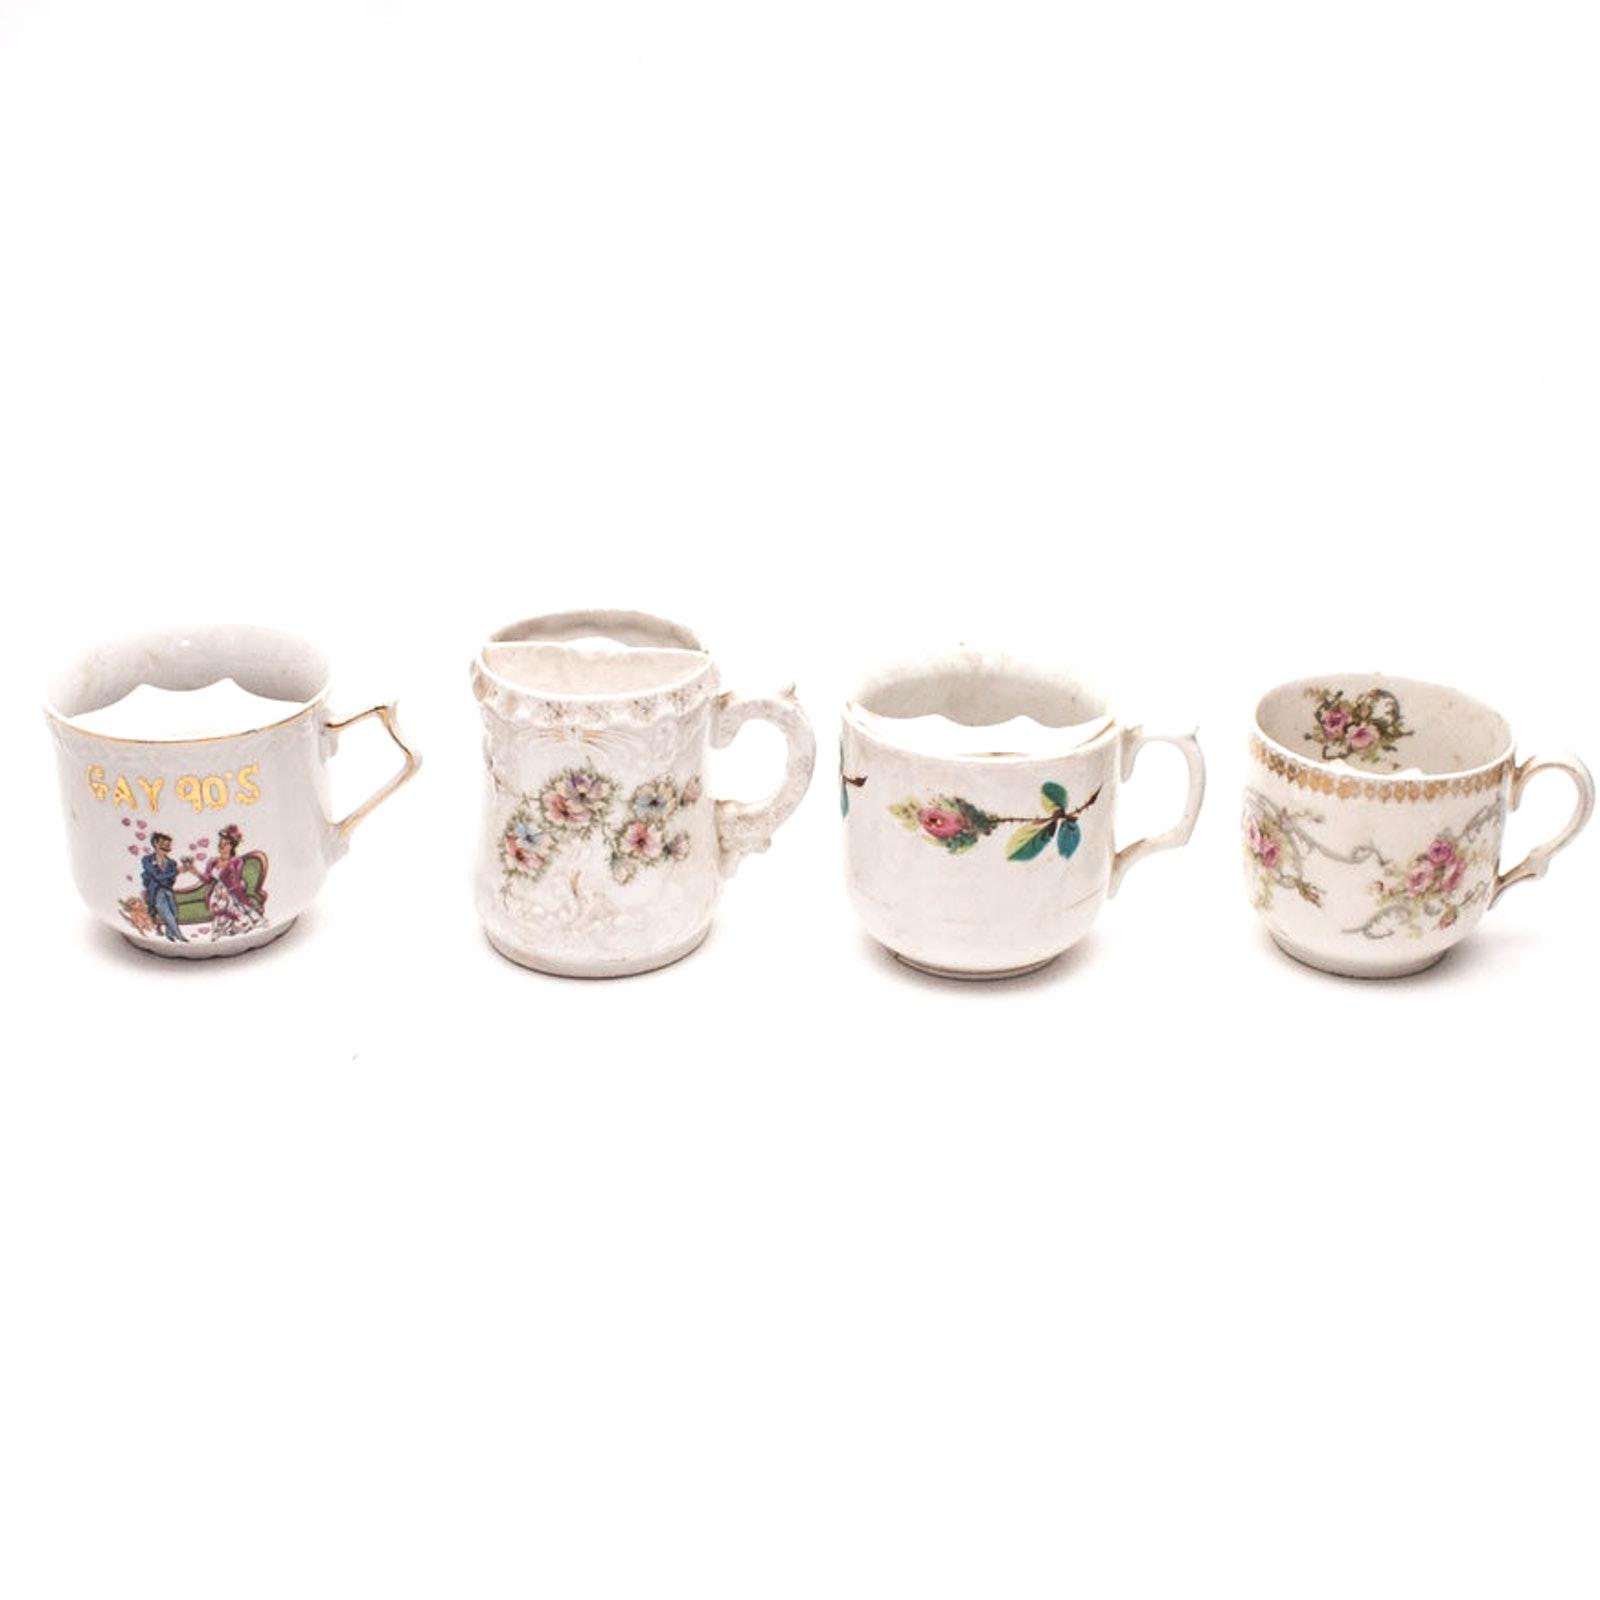 "Antique Mustache Cups Including Zeh, Scherzer & Co. ""Mignon"""